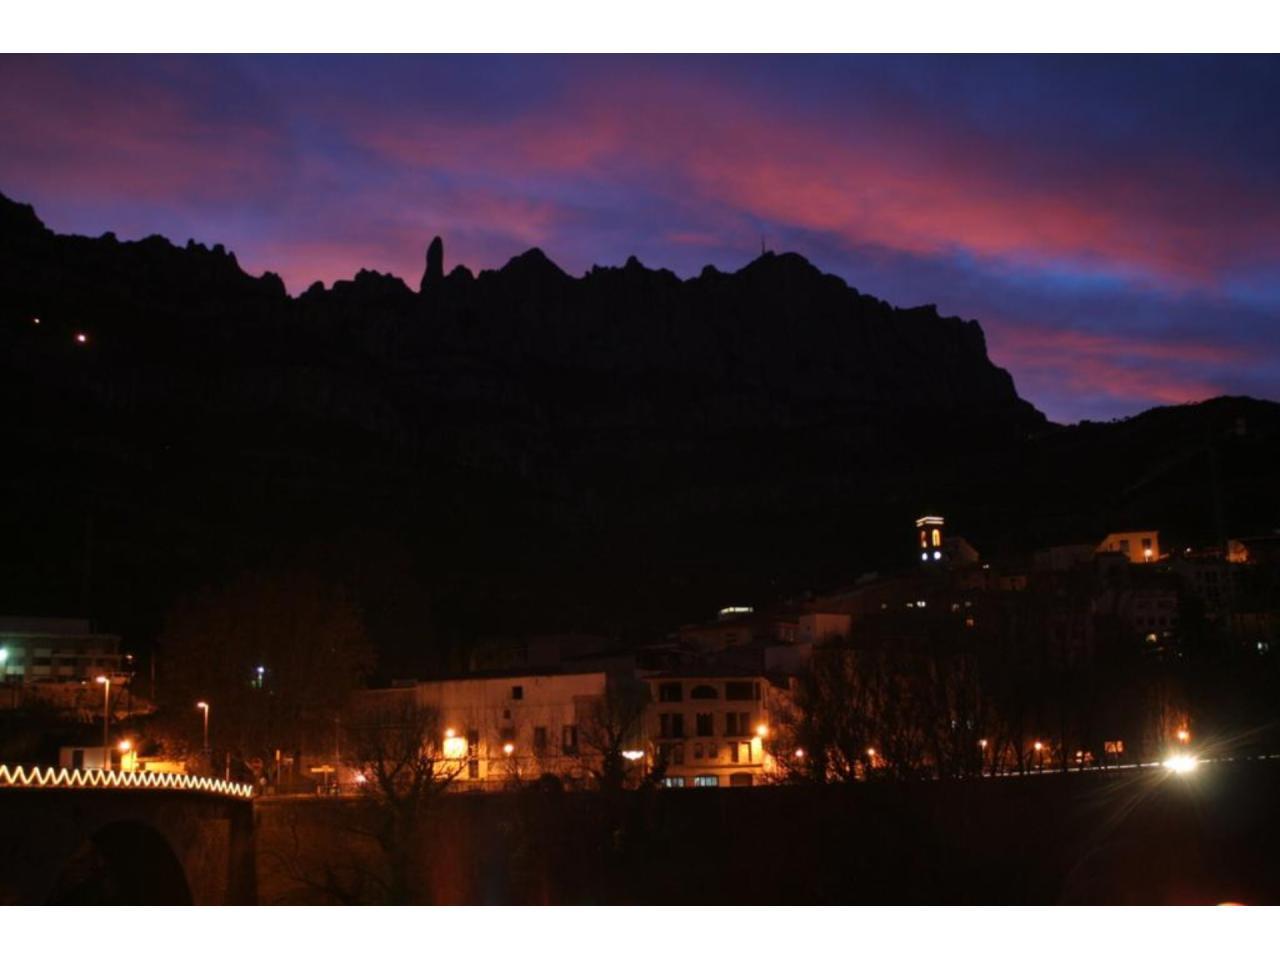 MONISTROL DE MONTSERRAT - Monistrol de Montserrat